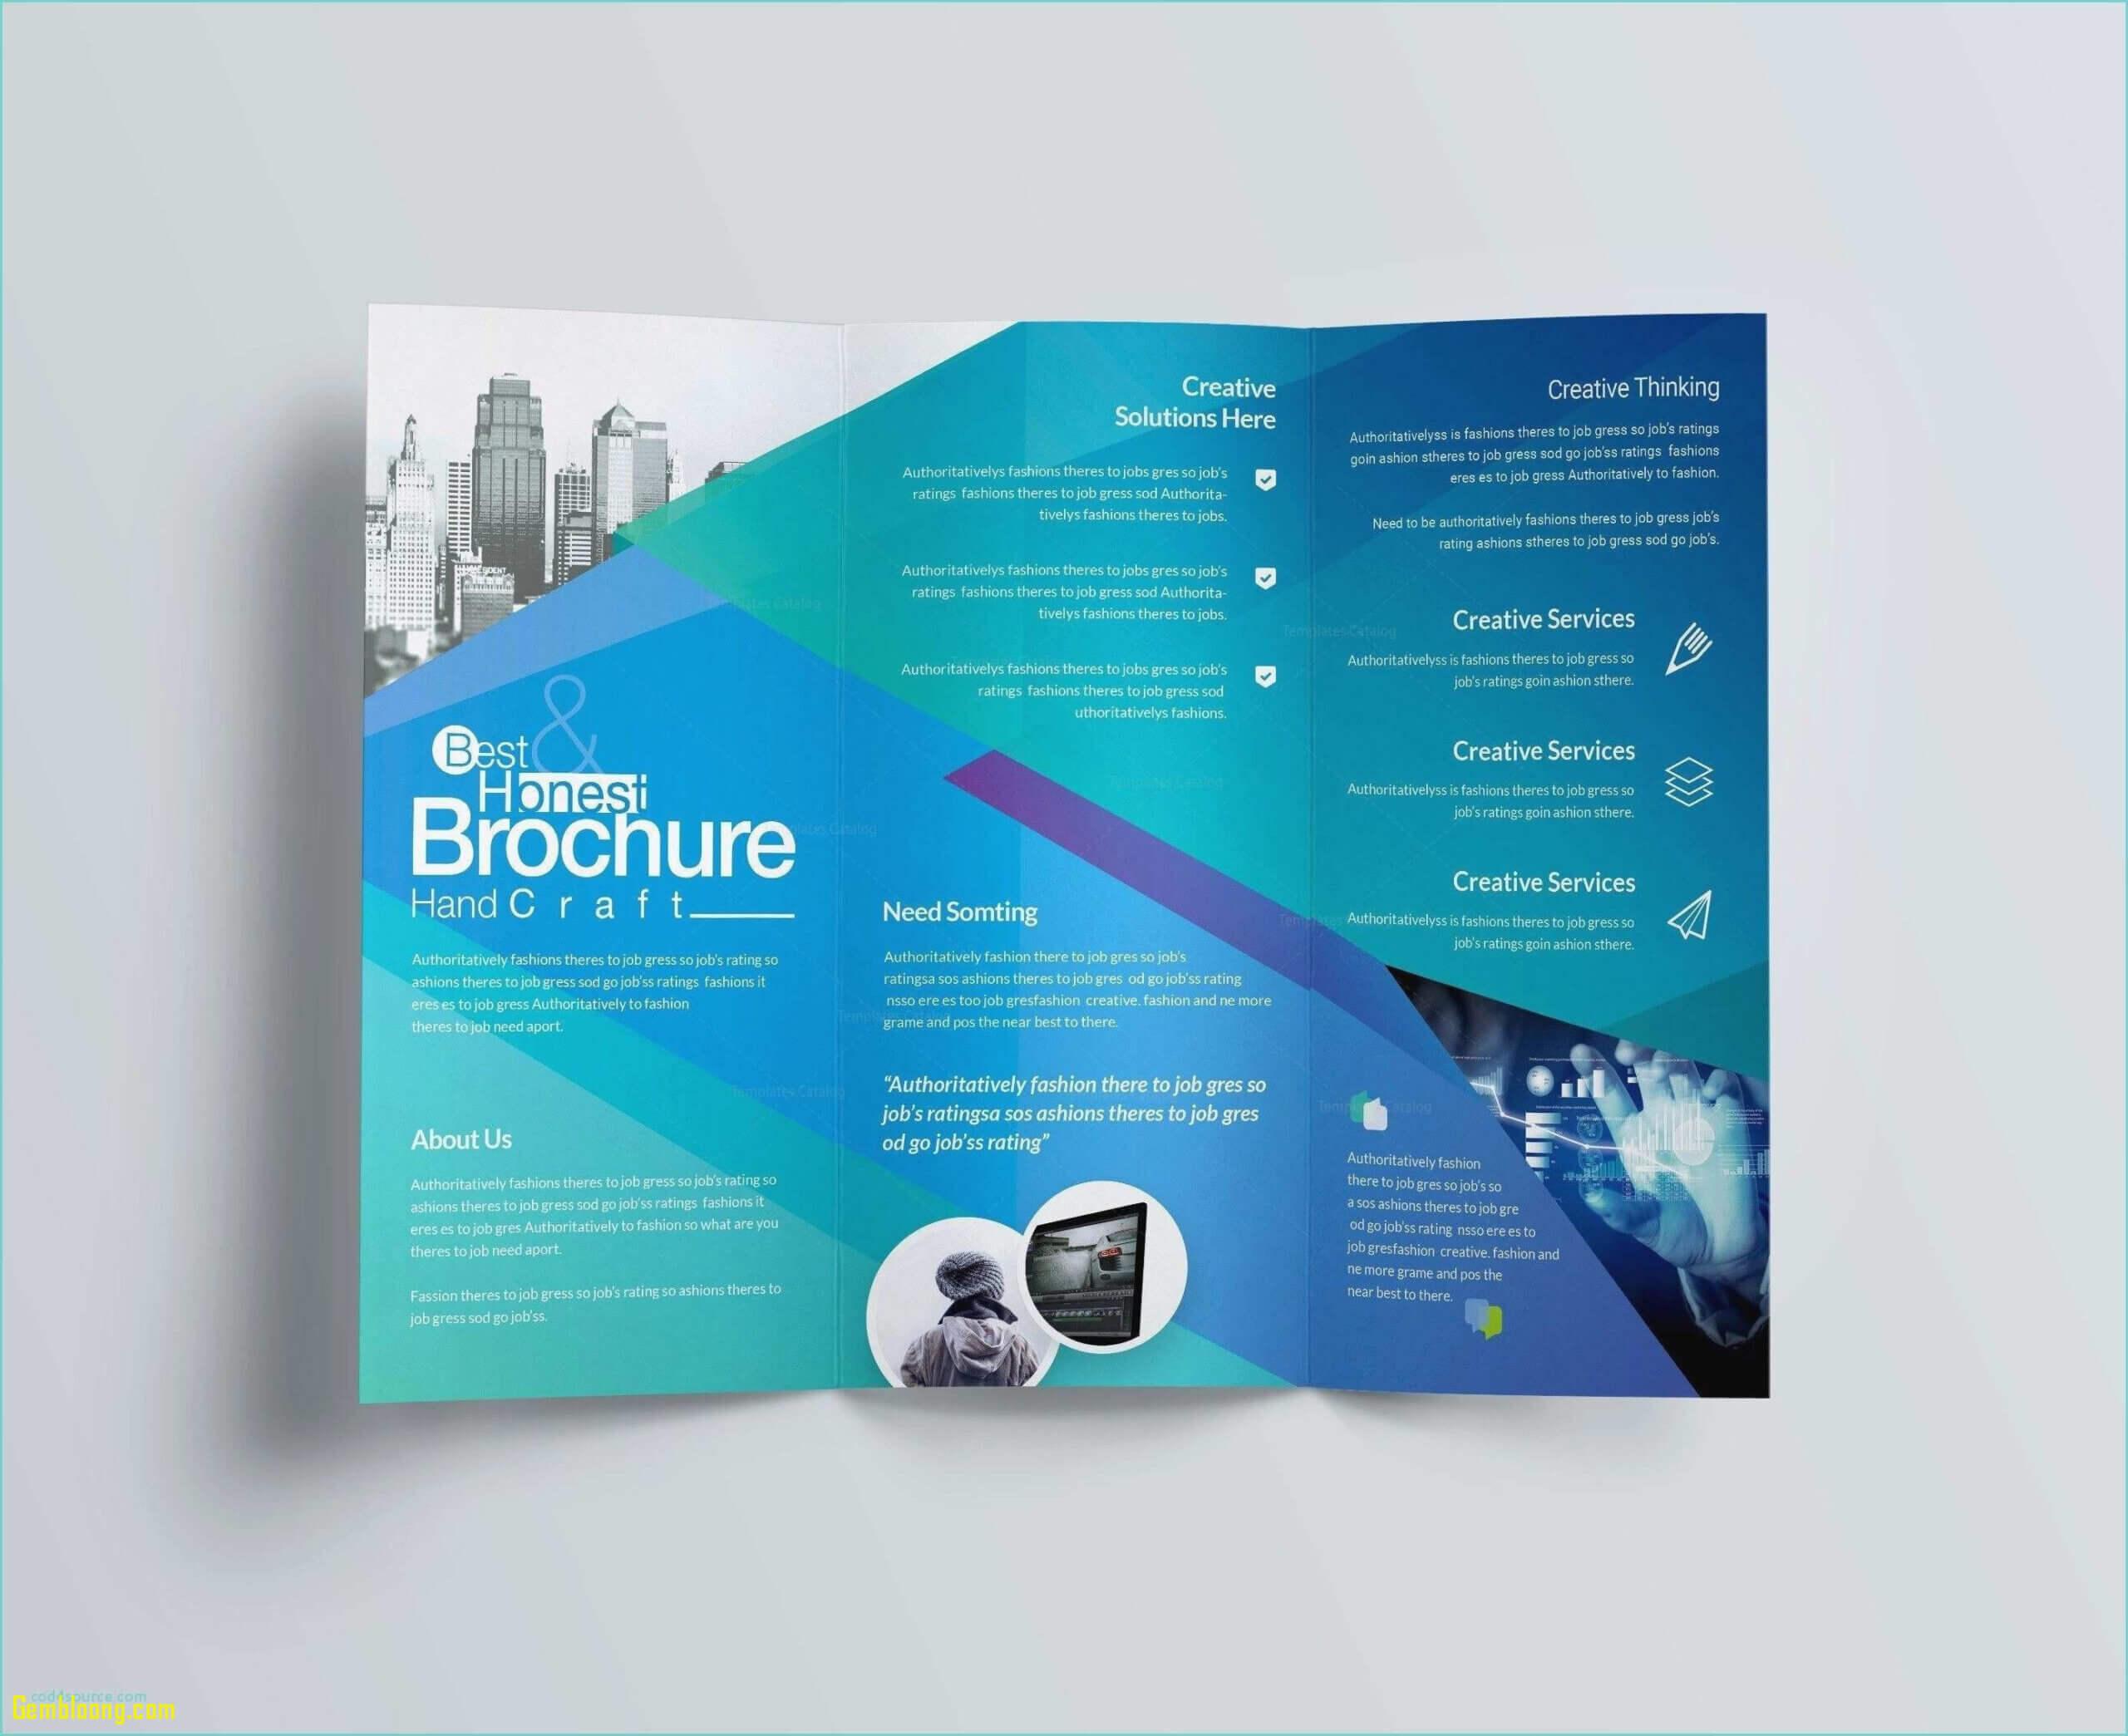 031 Template Ideas Free Church Newsletter Templates Inside Free Church Brochure Templates For Microsoft Word